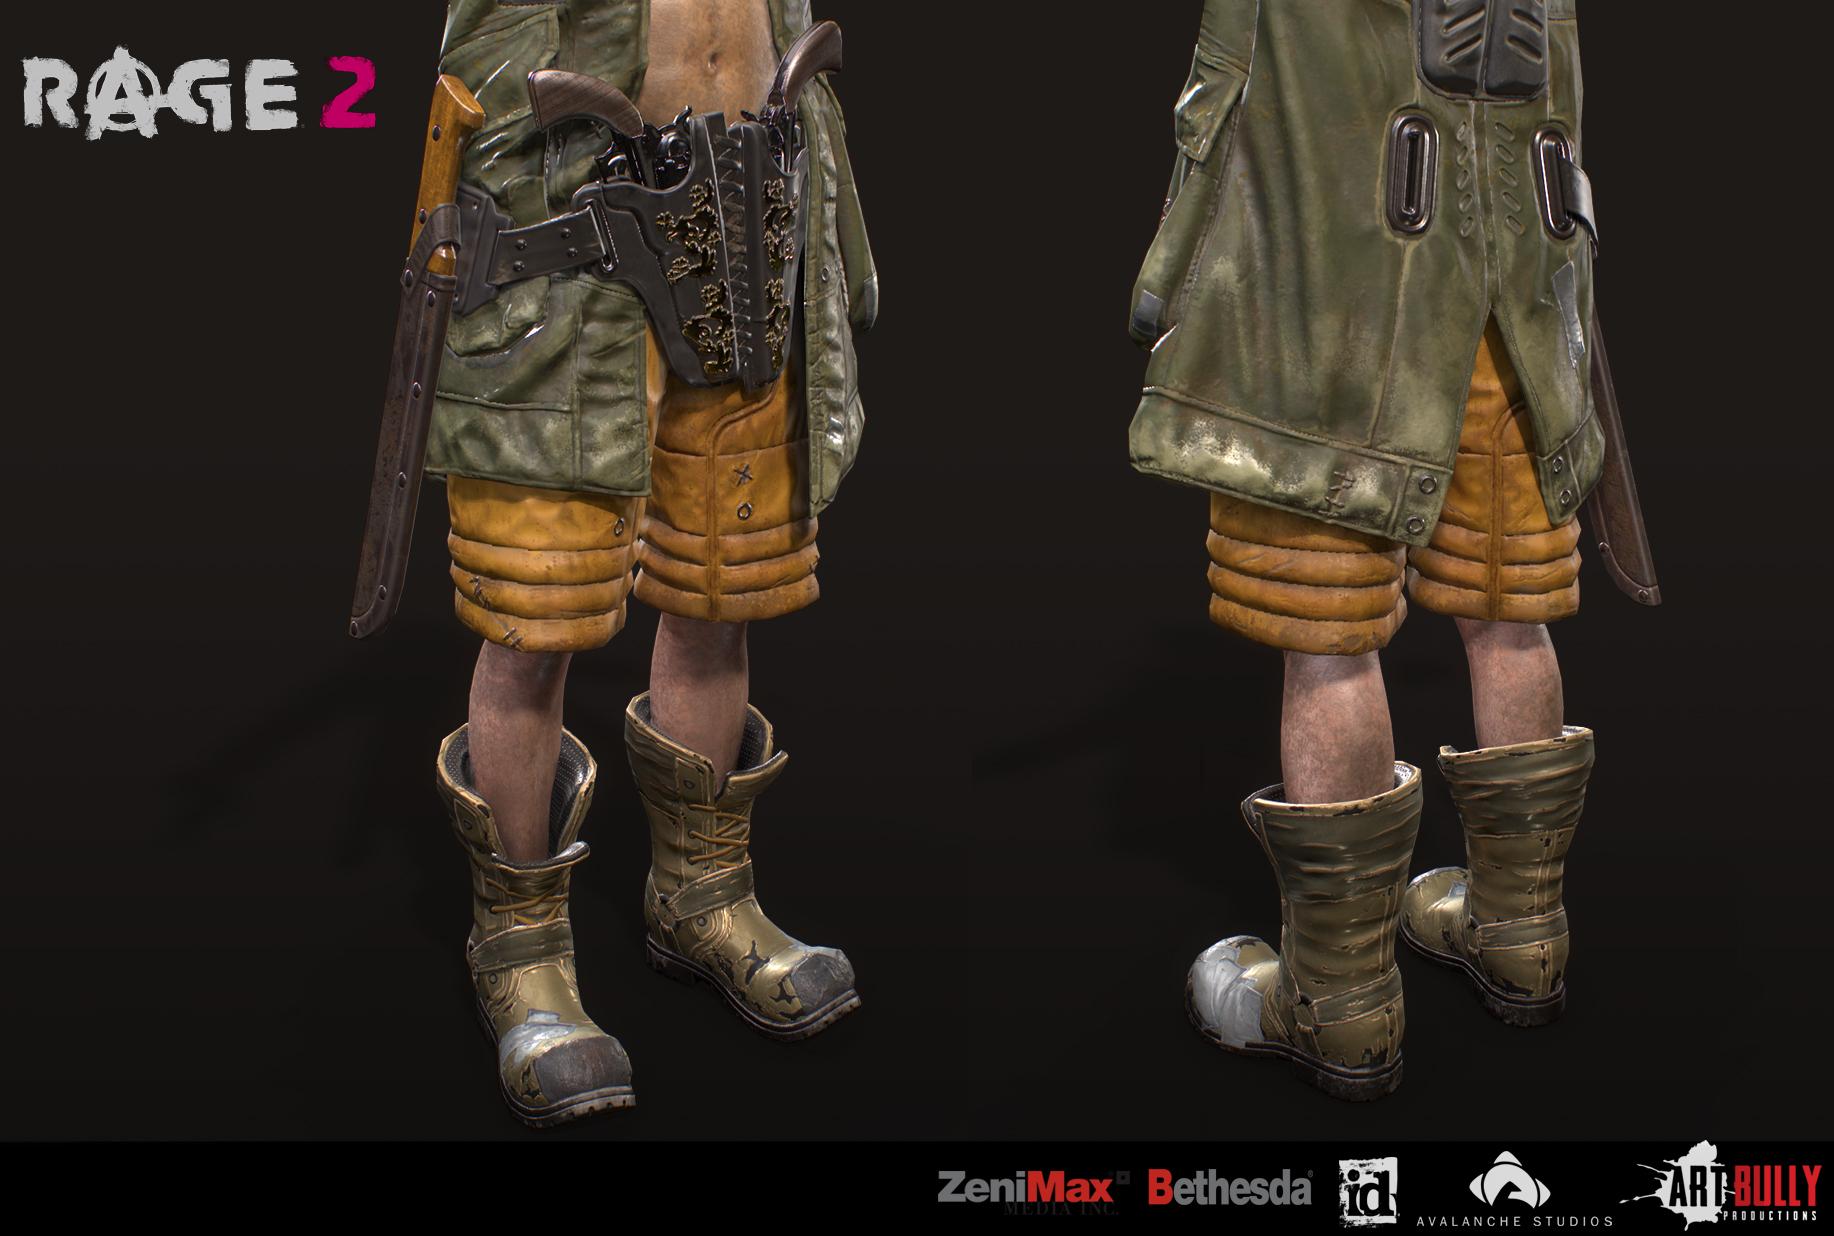 Chazz_Morass_Closeup_Legs.jpg